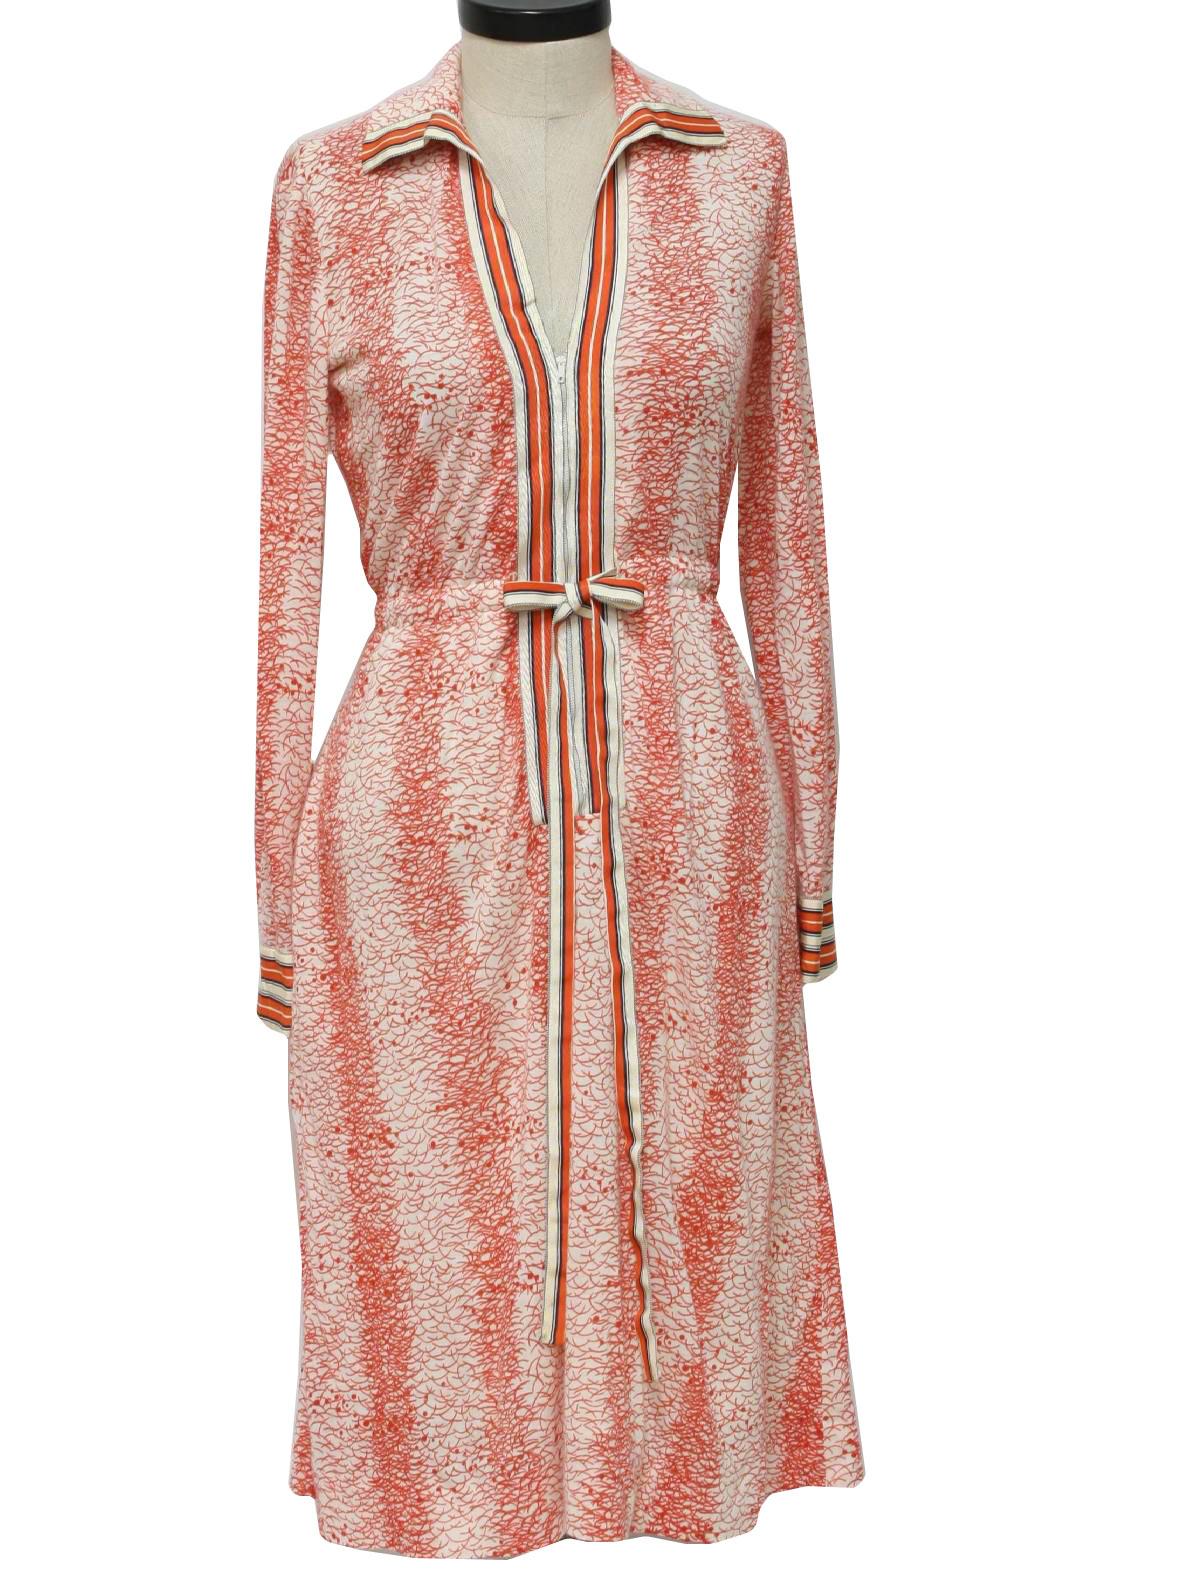 Lillie Rubin Collection 700 1970s Vintage Dress: mid 60s -Lillie ...